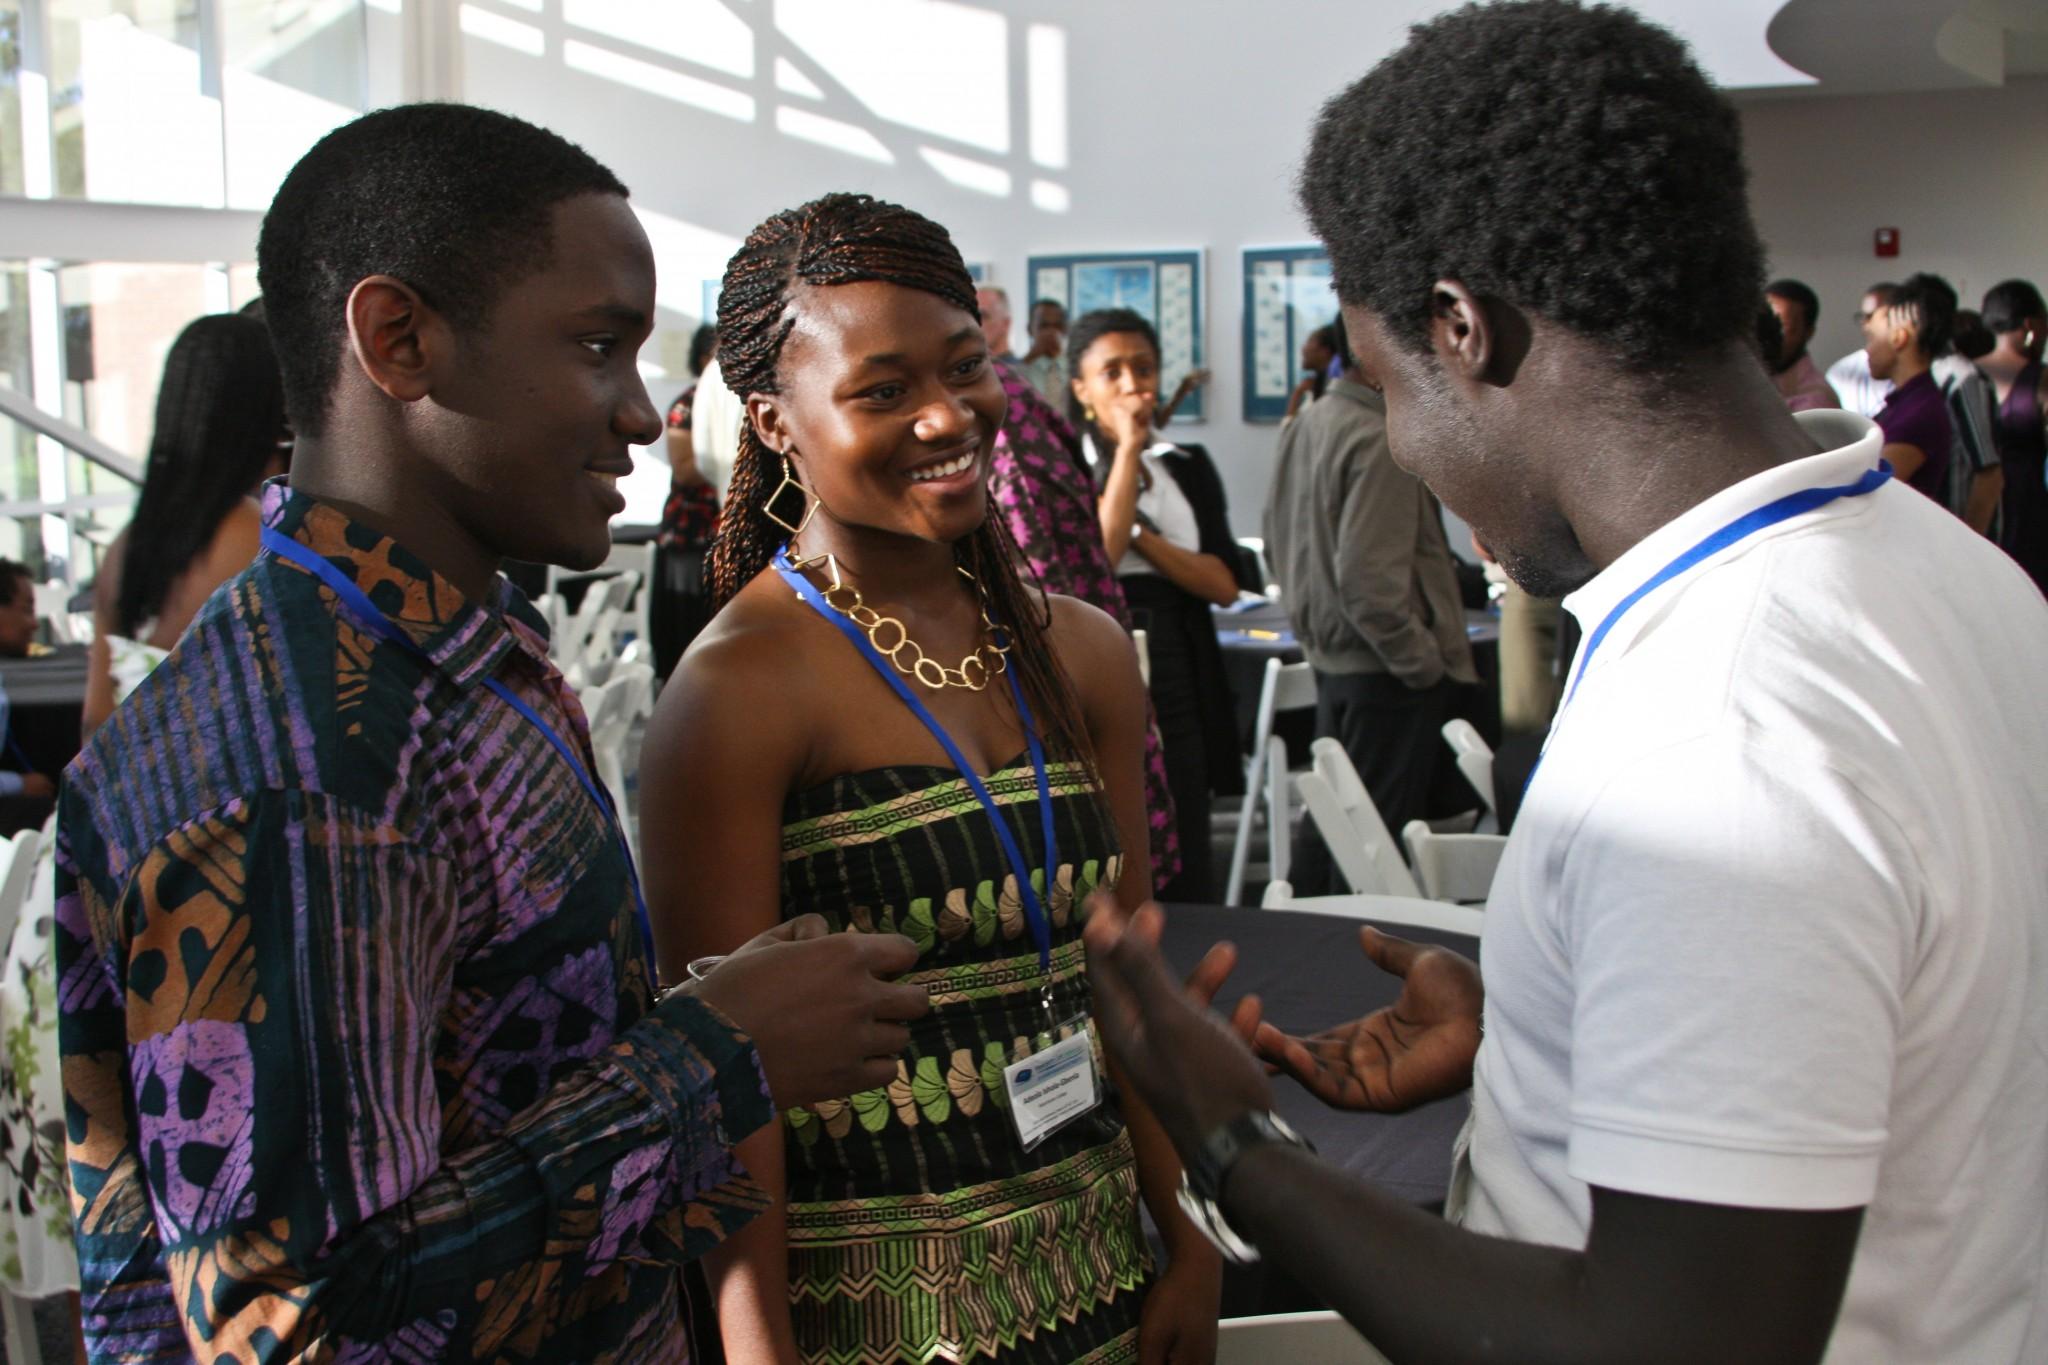 african_students.jpg